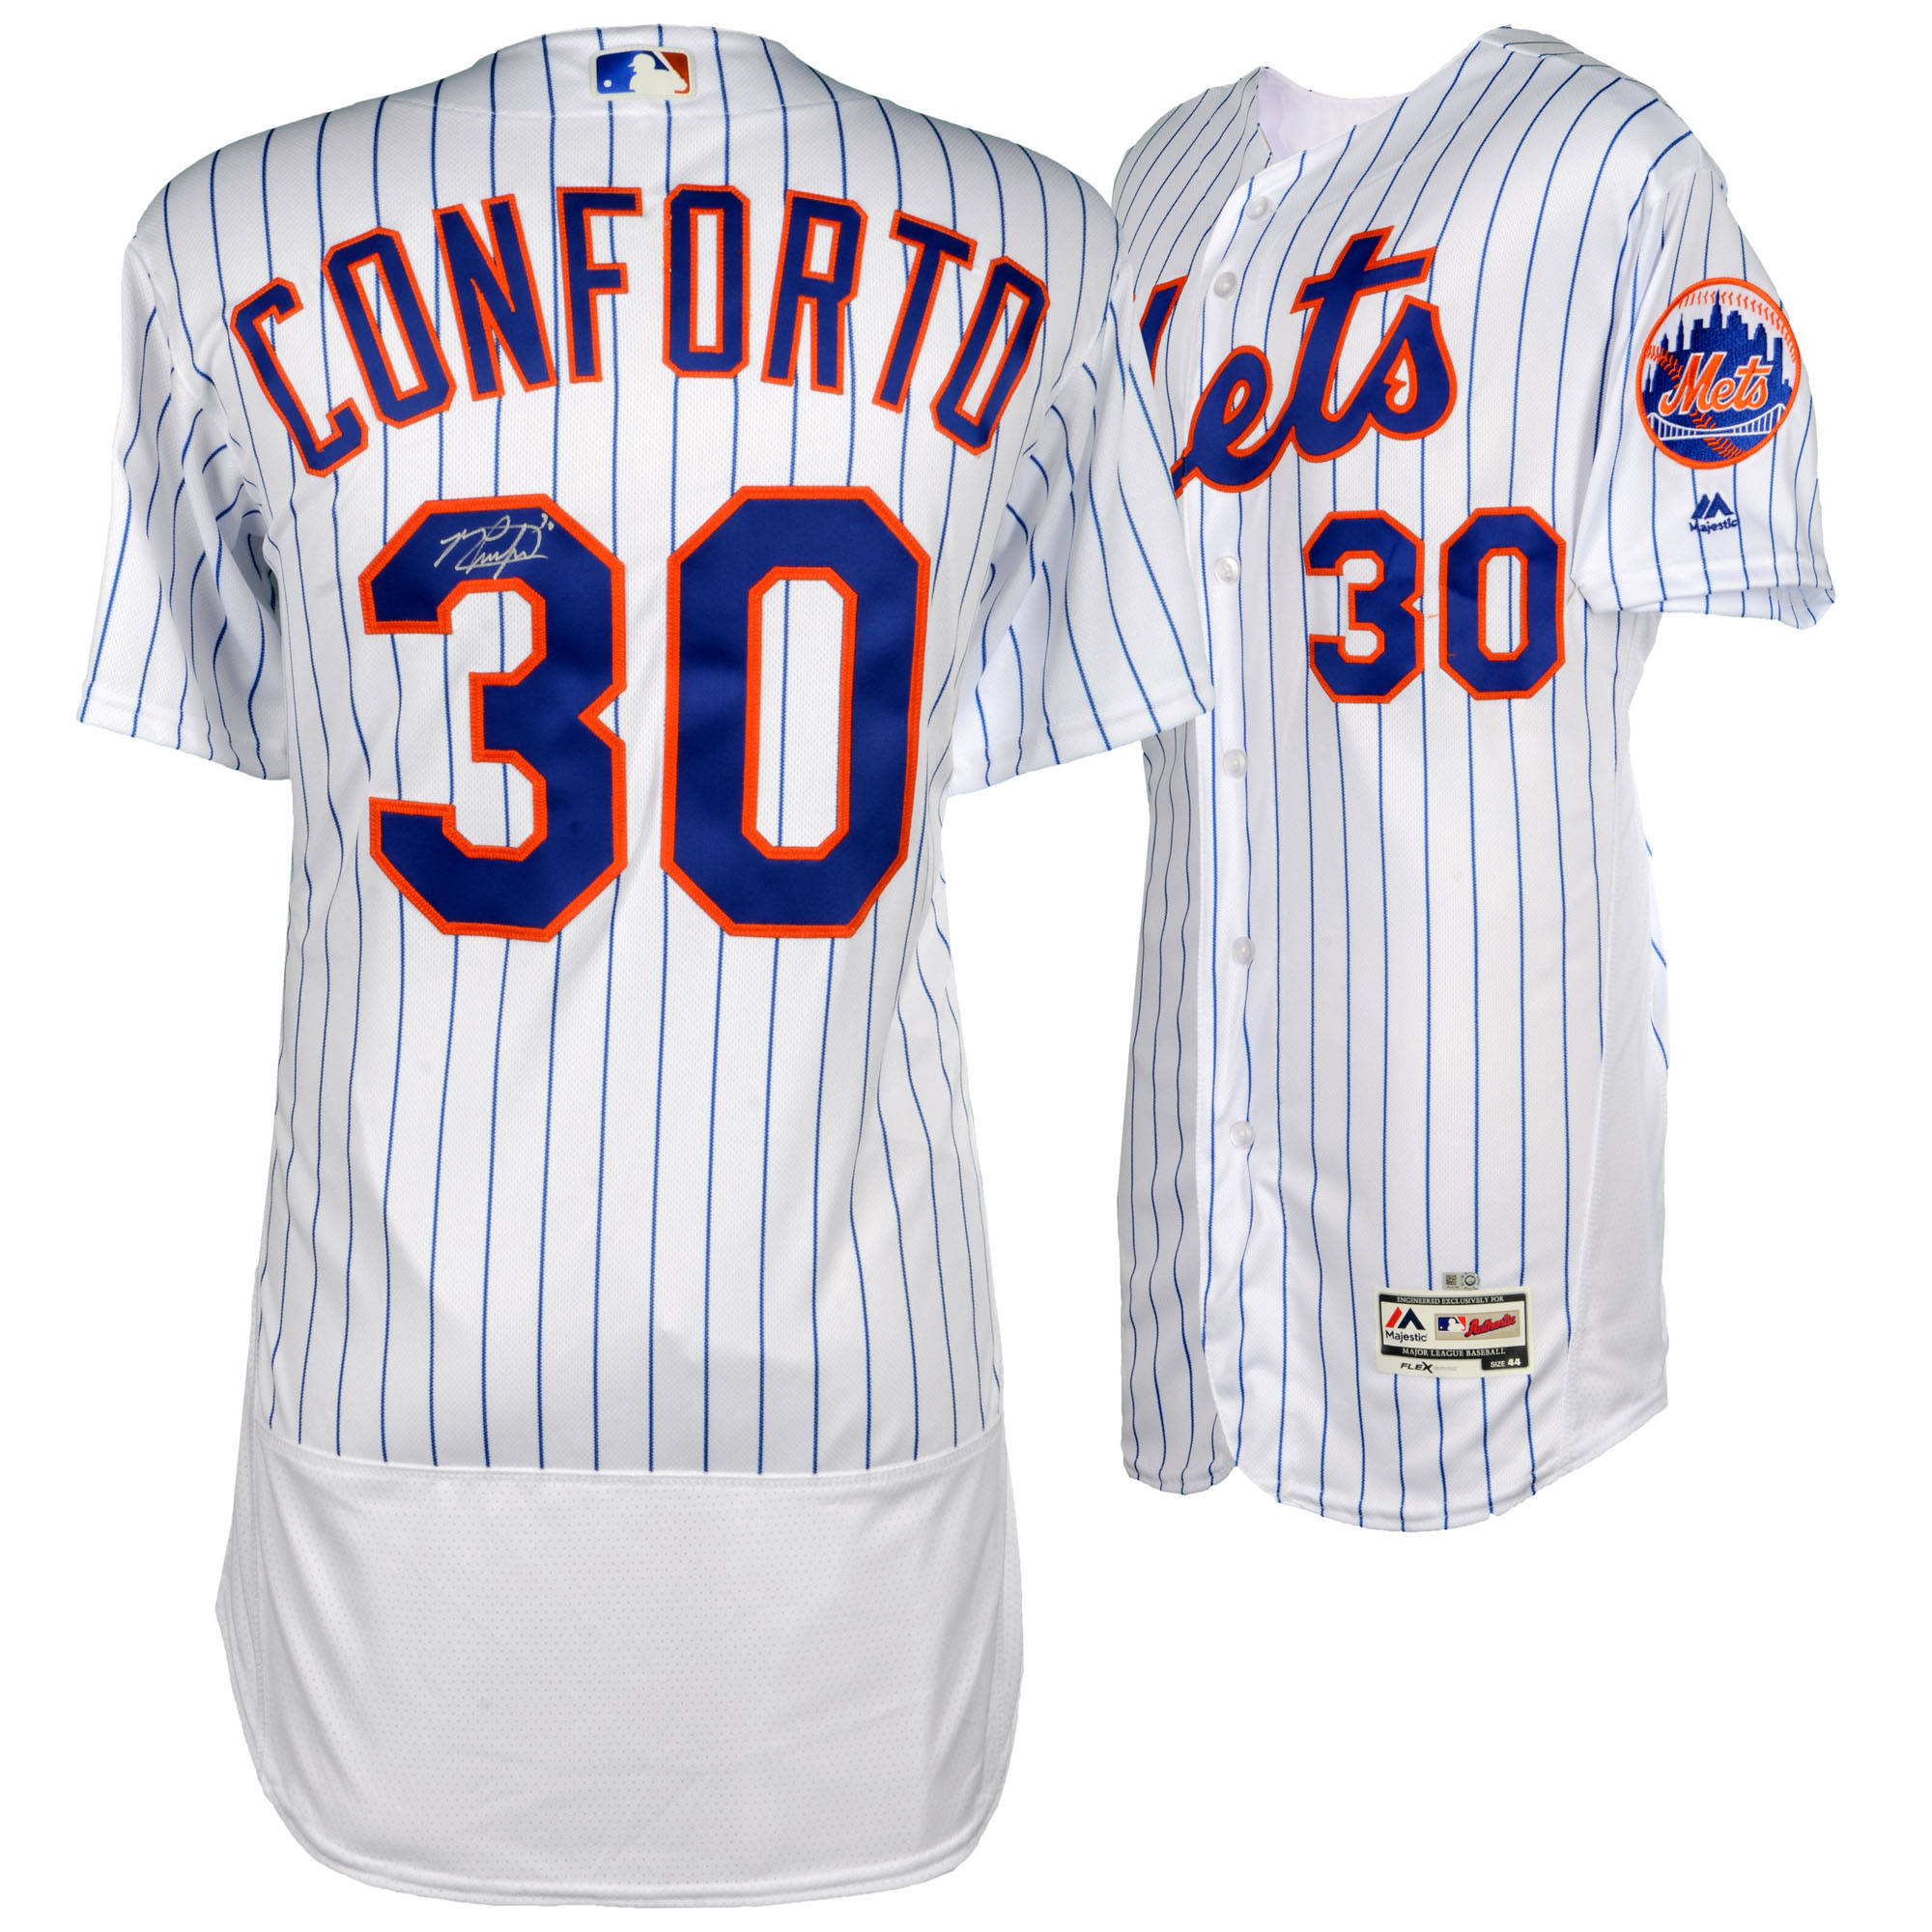 Michael Conforto New York Mets Fanatics Authentic Autographed Majestic White Authentic Jersey - No Size